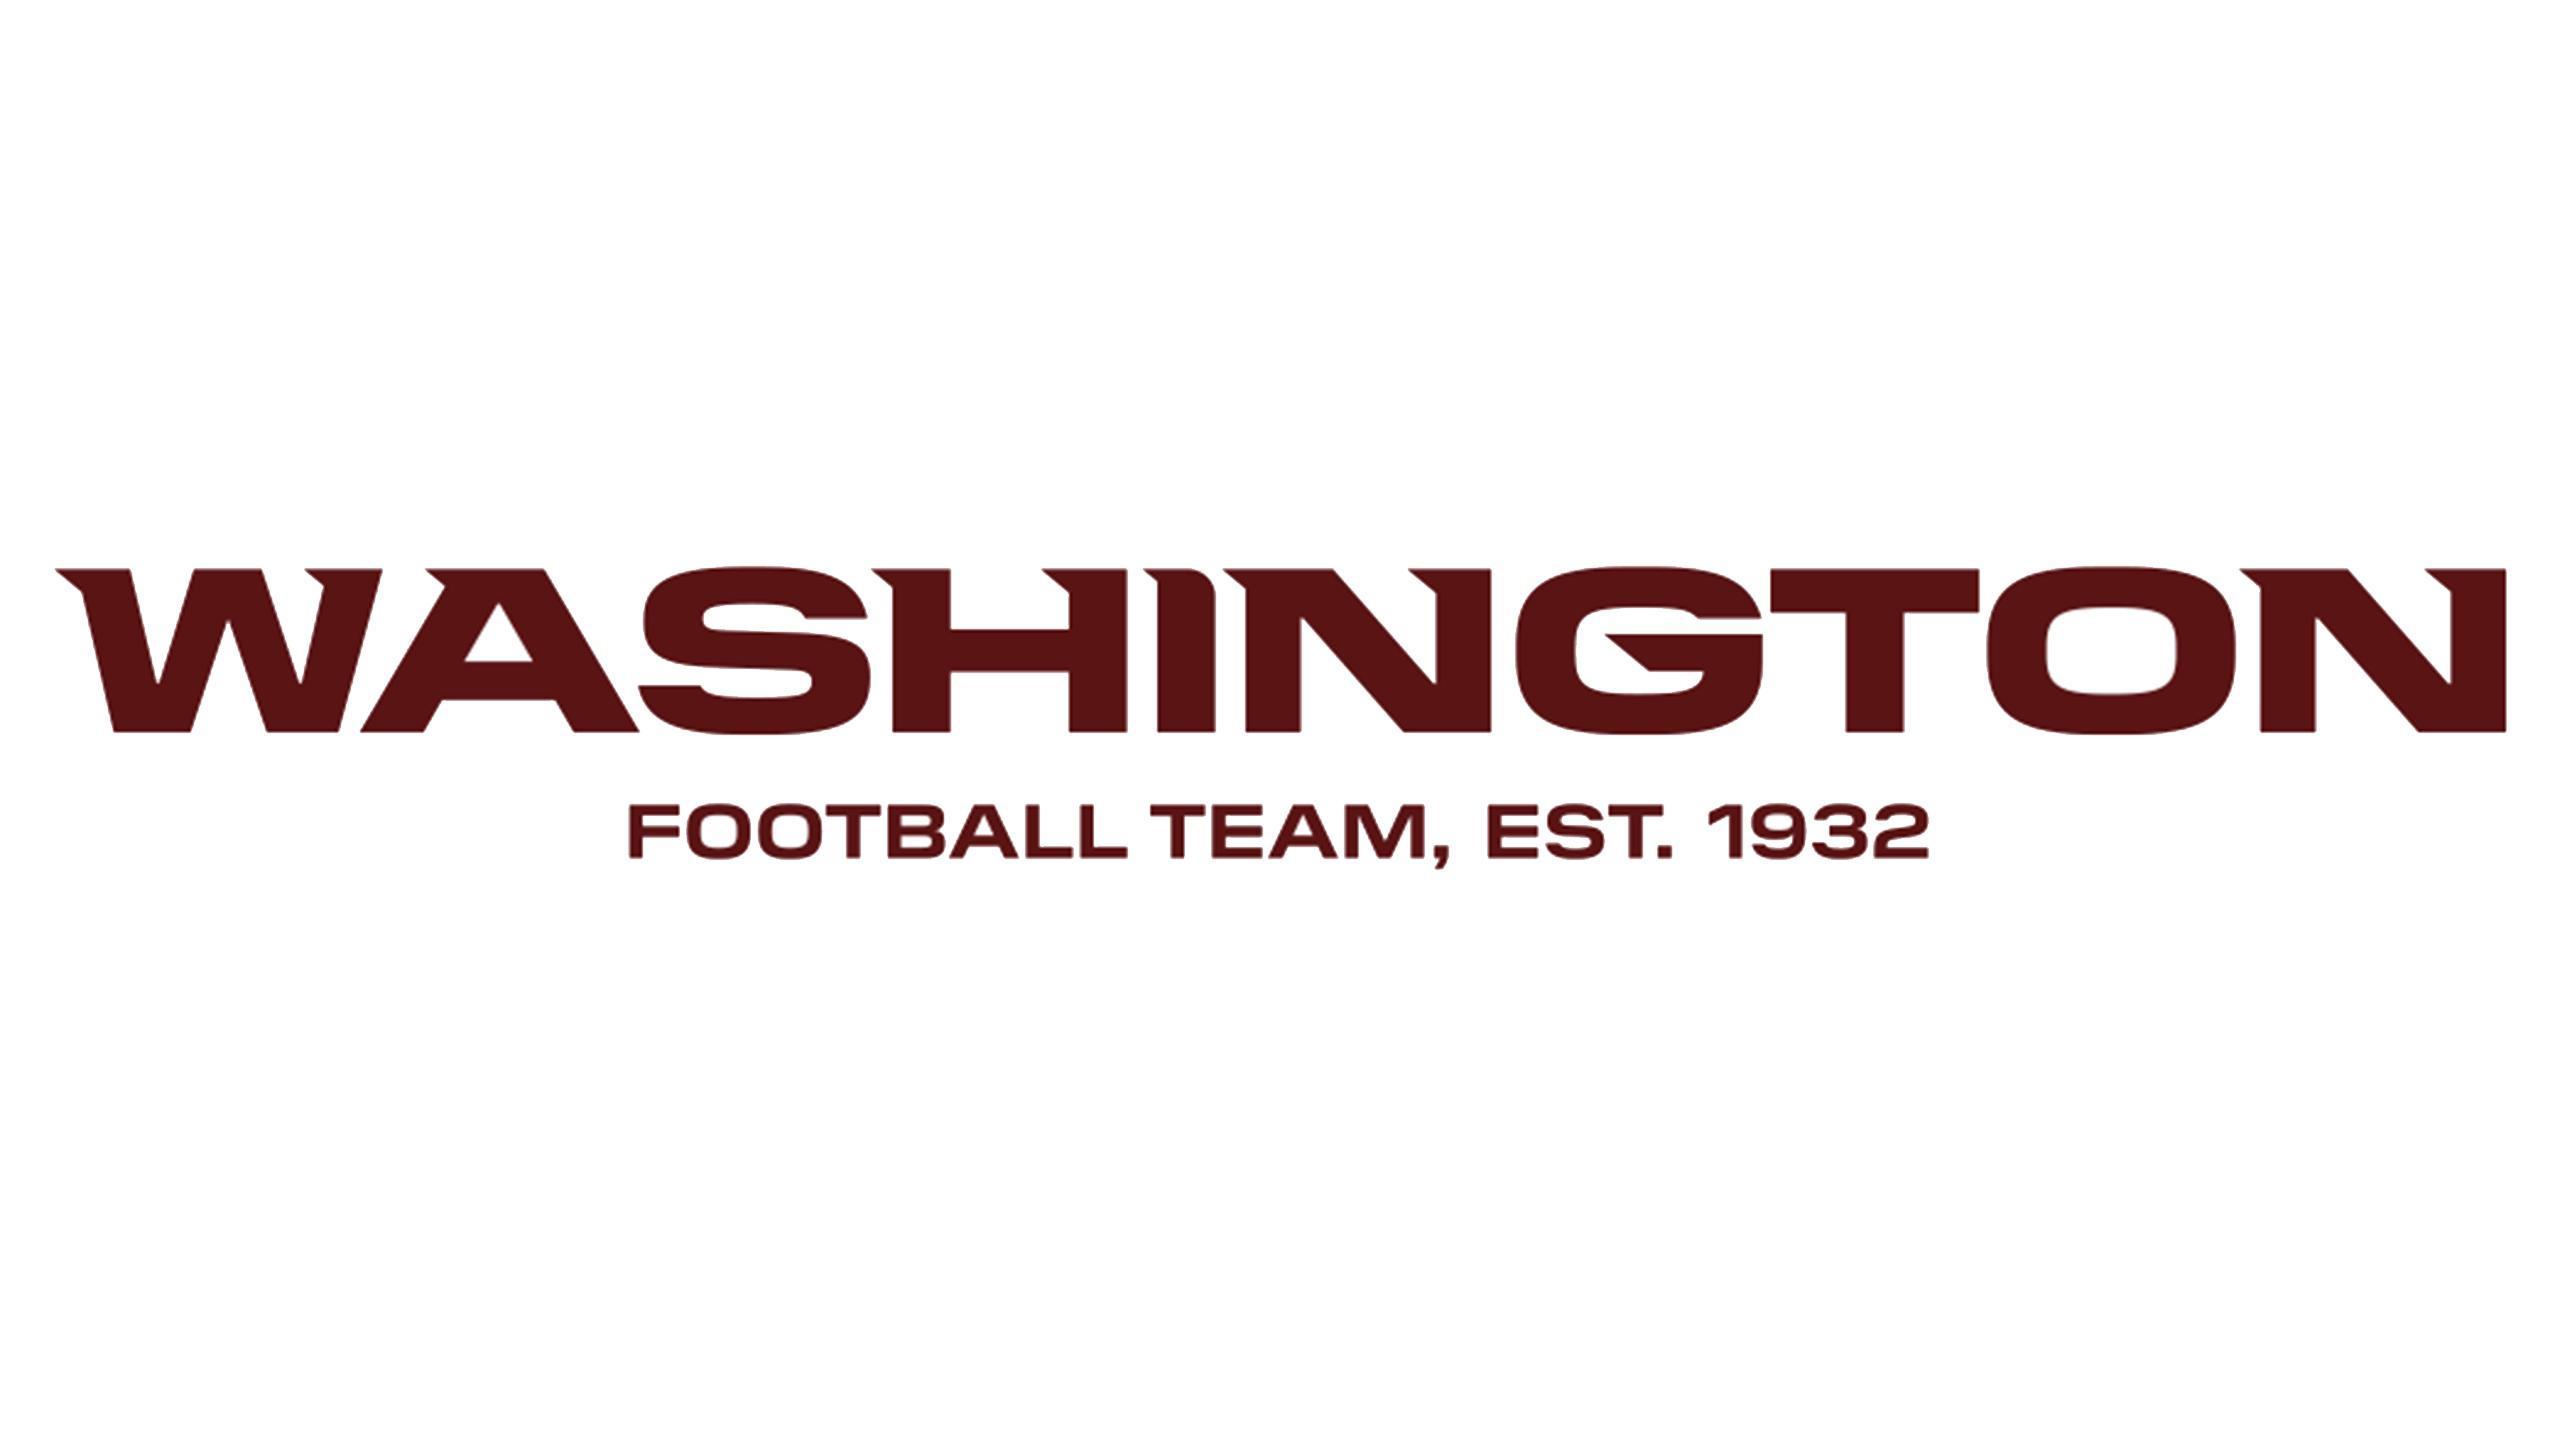 WashingtonFootball.com